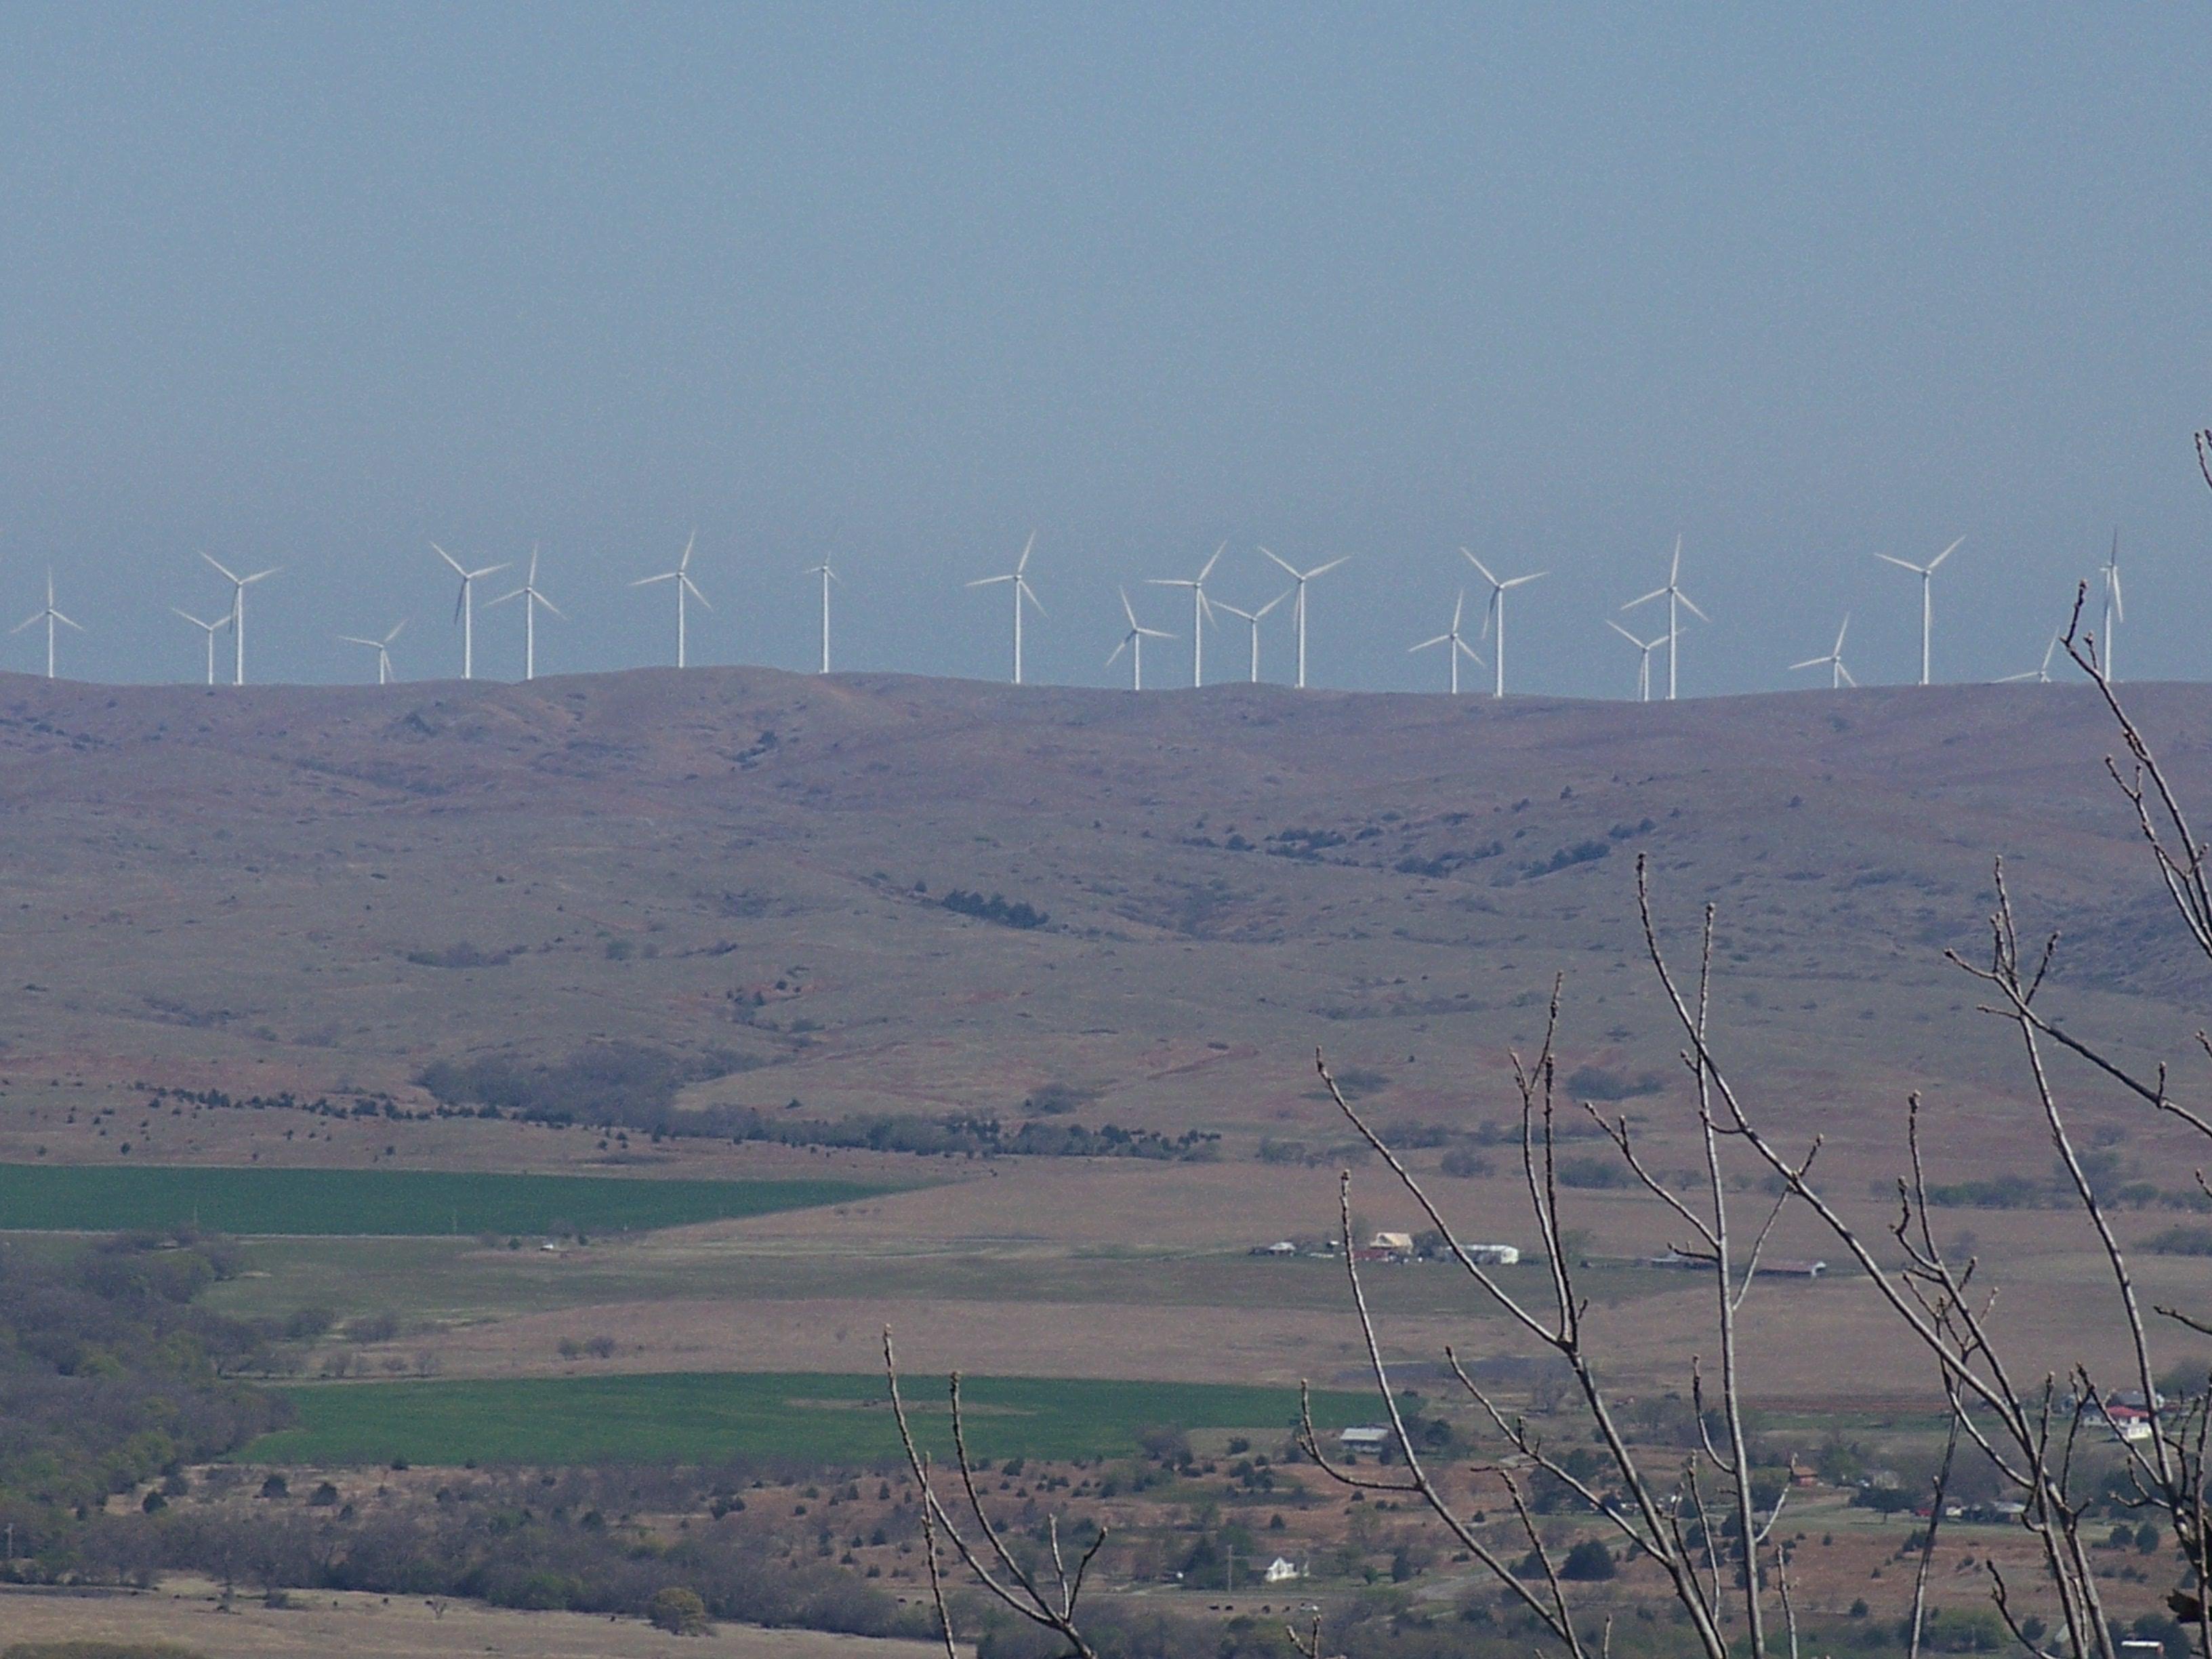 Wind power in Oklahoma - Wikipedia